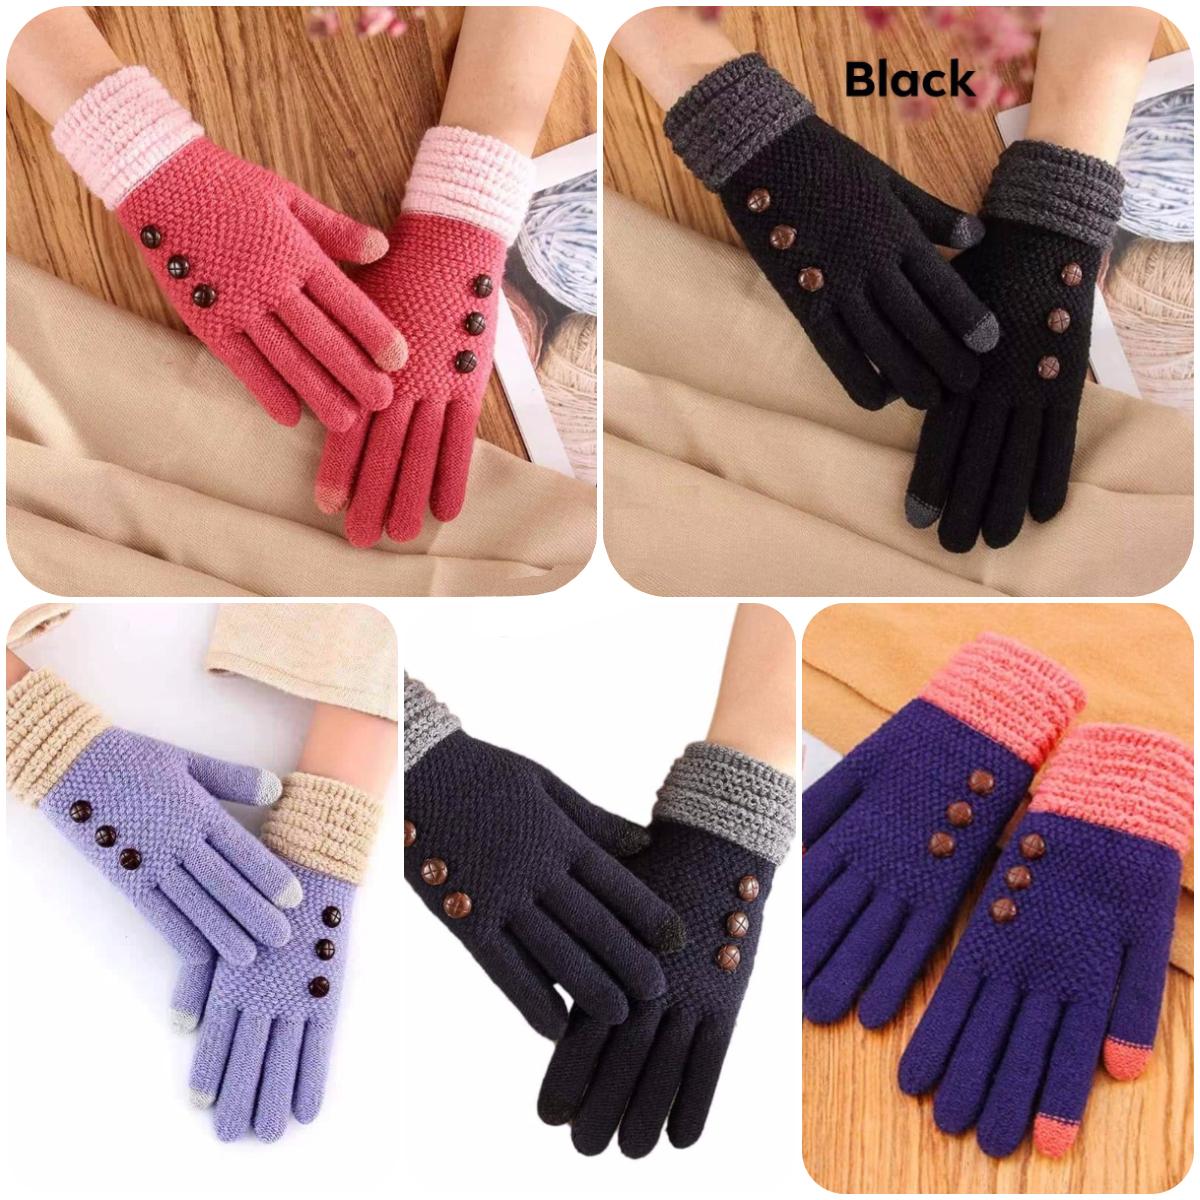 Unisex Stylish Winter Hand Gloves